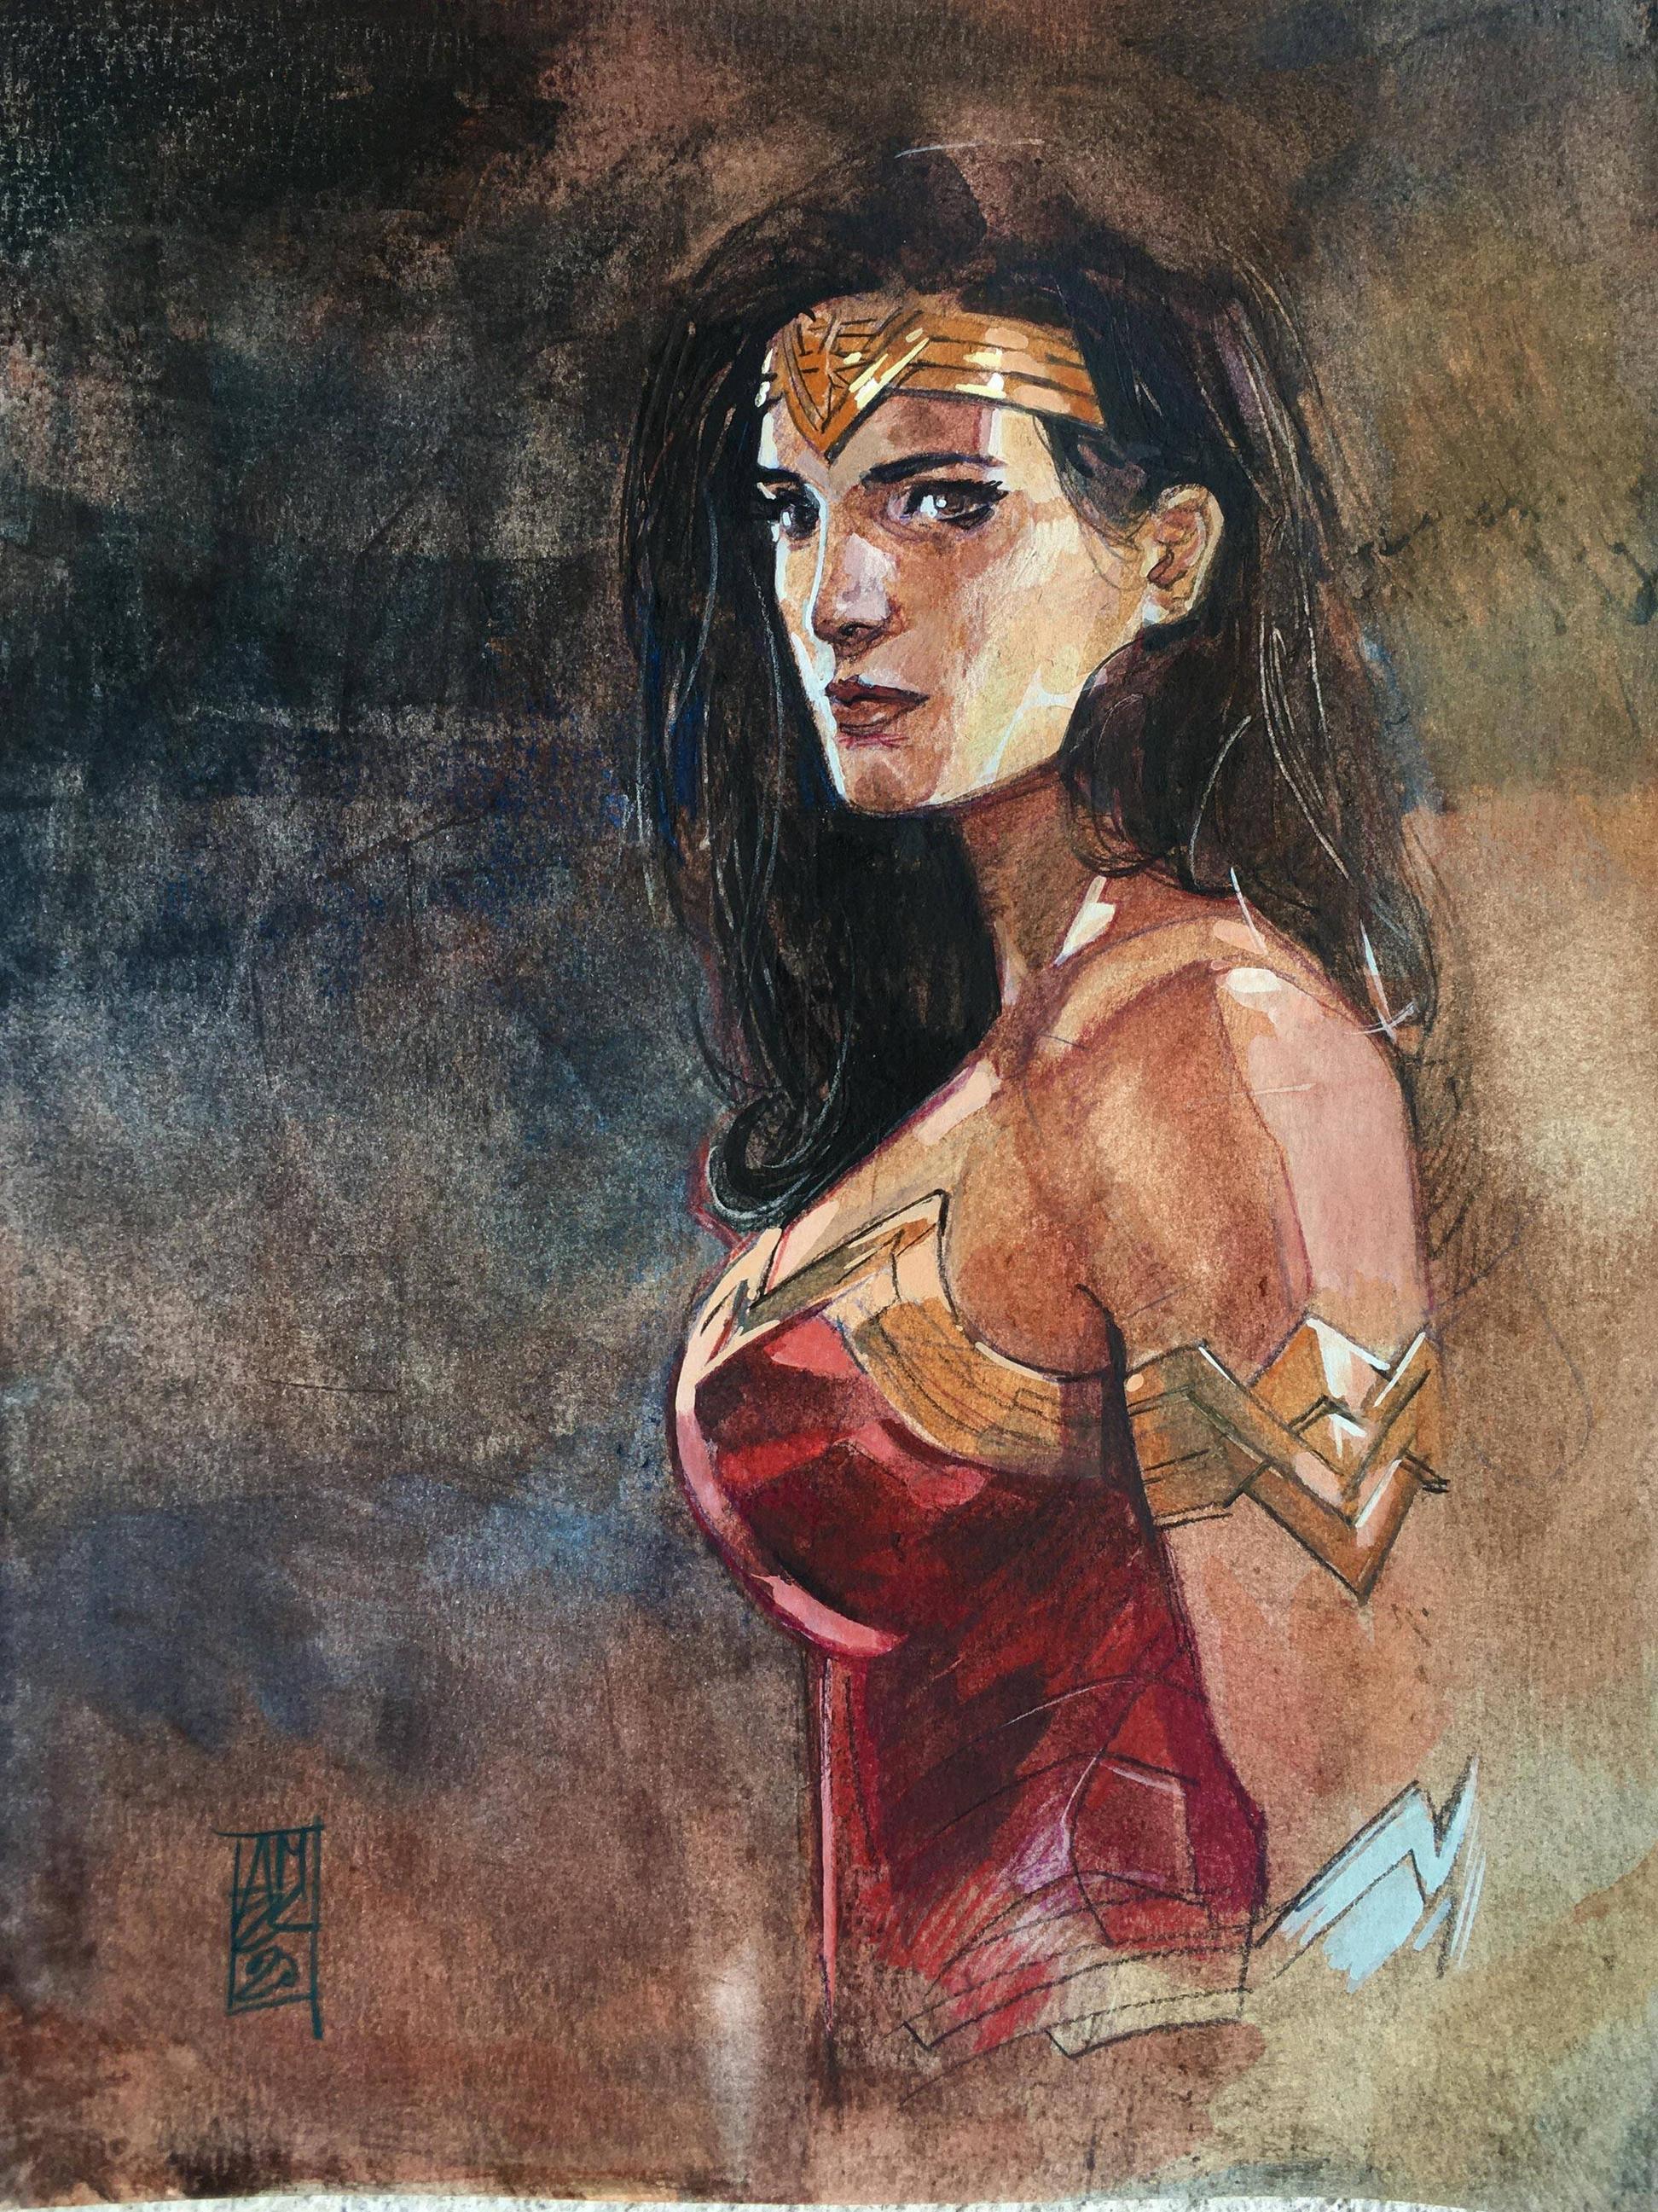 Wonder Woman by Alex Maleev